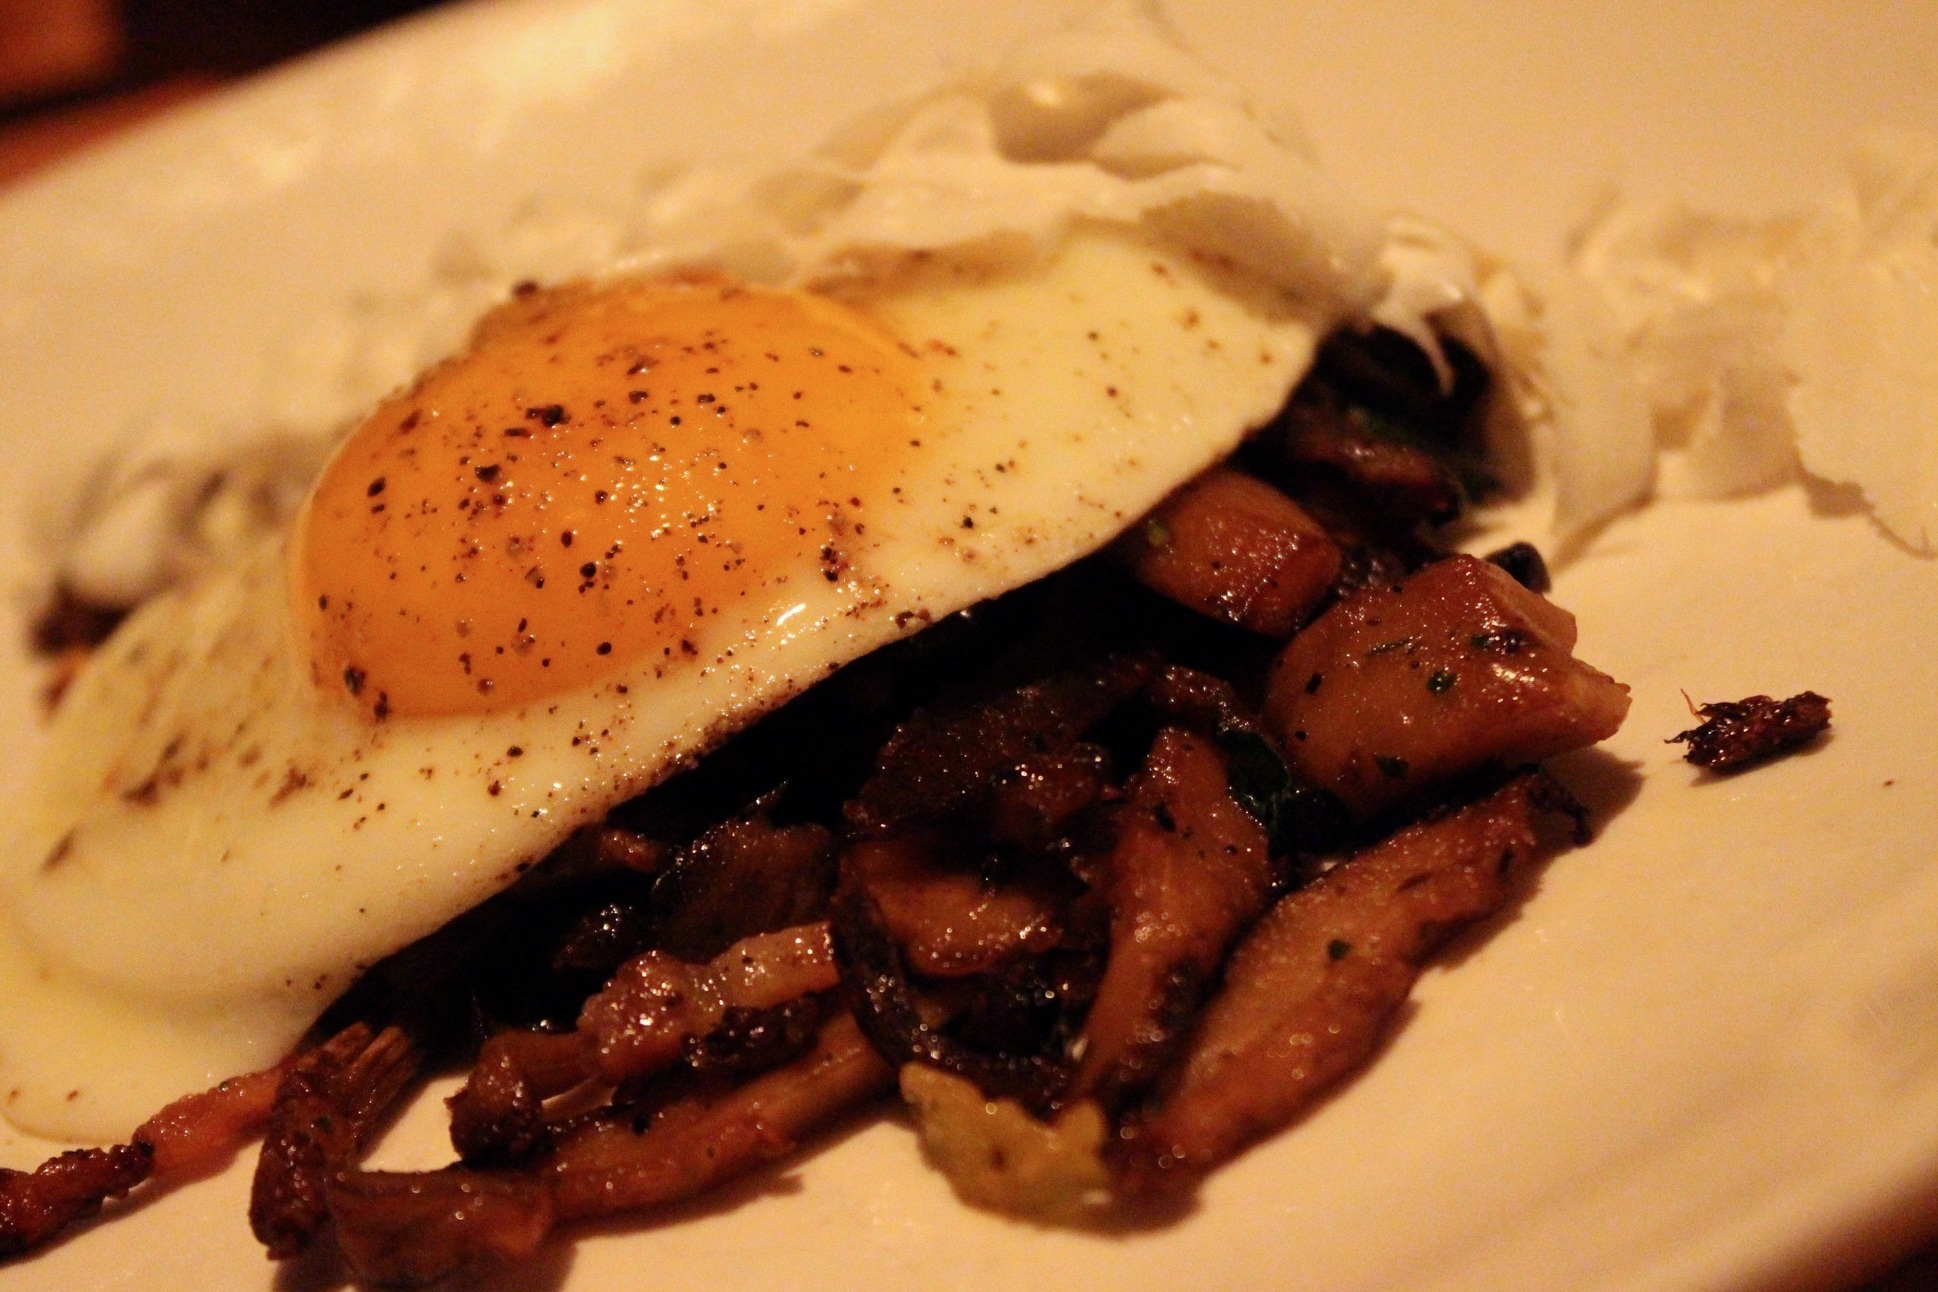 Roasted mushrooms, pancetta, fried egg, ricotta salata at L'Artusi